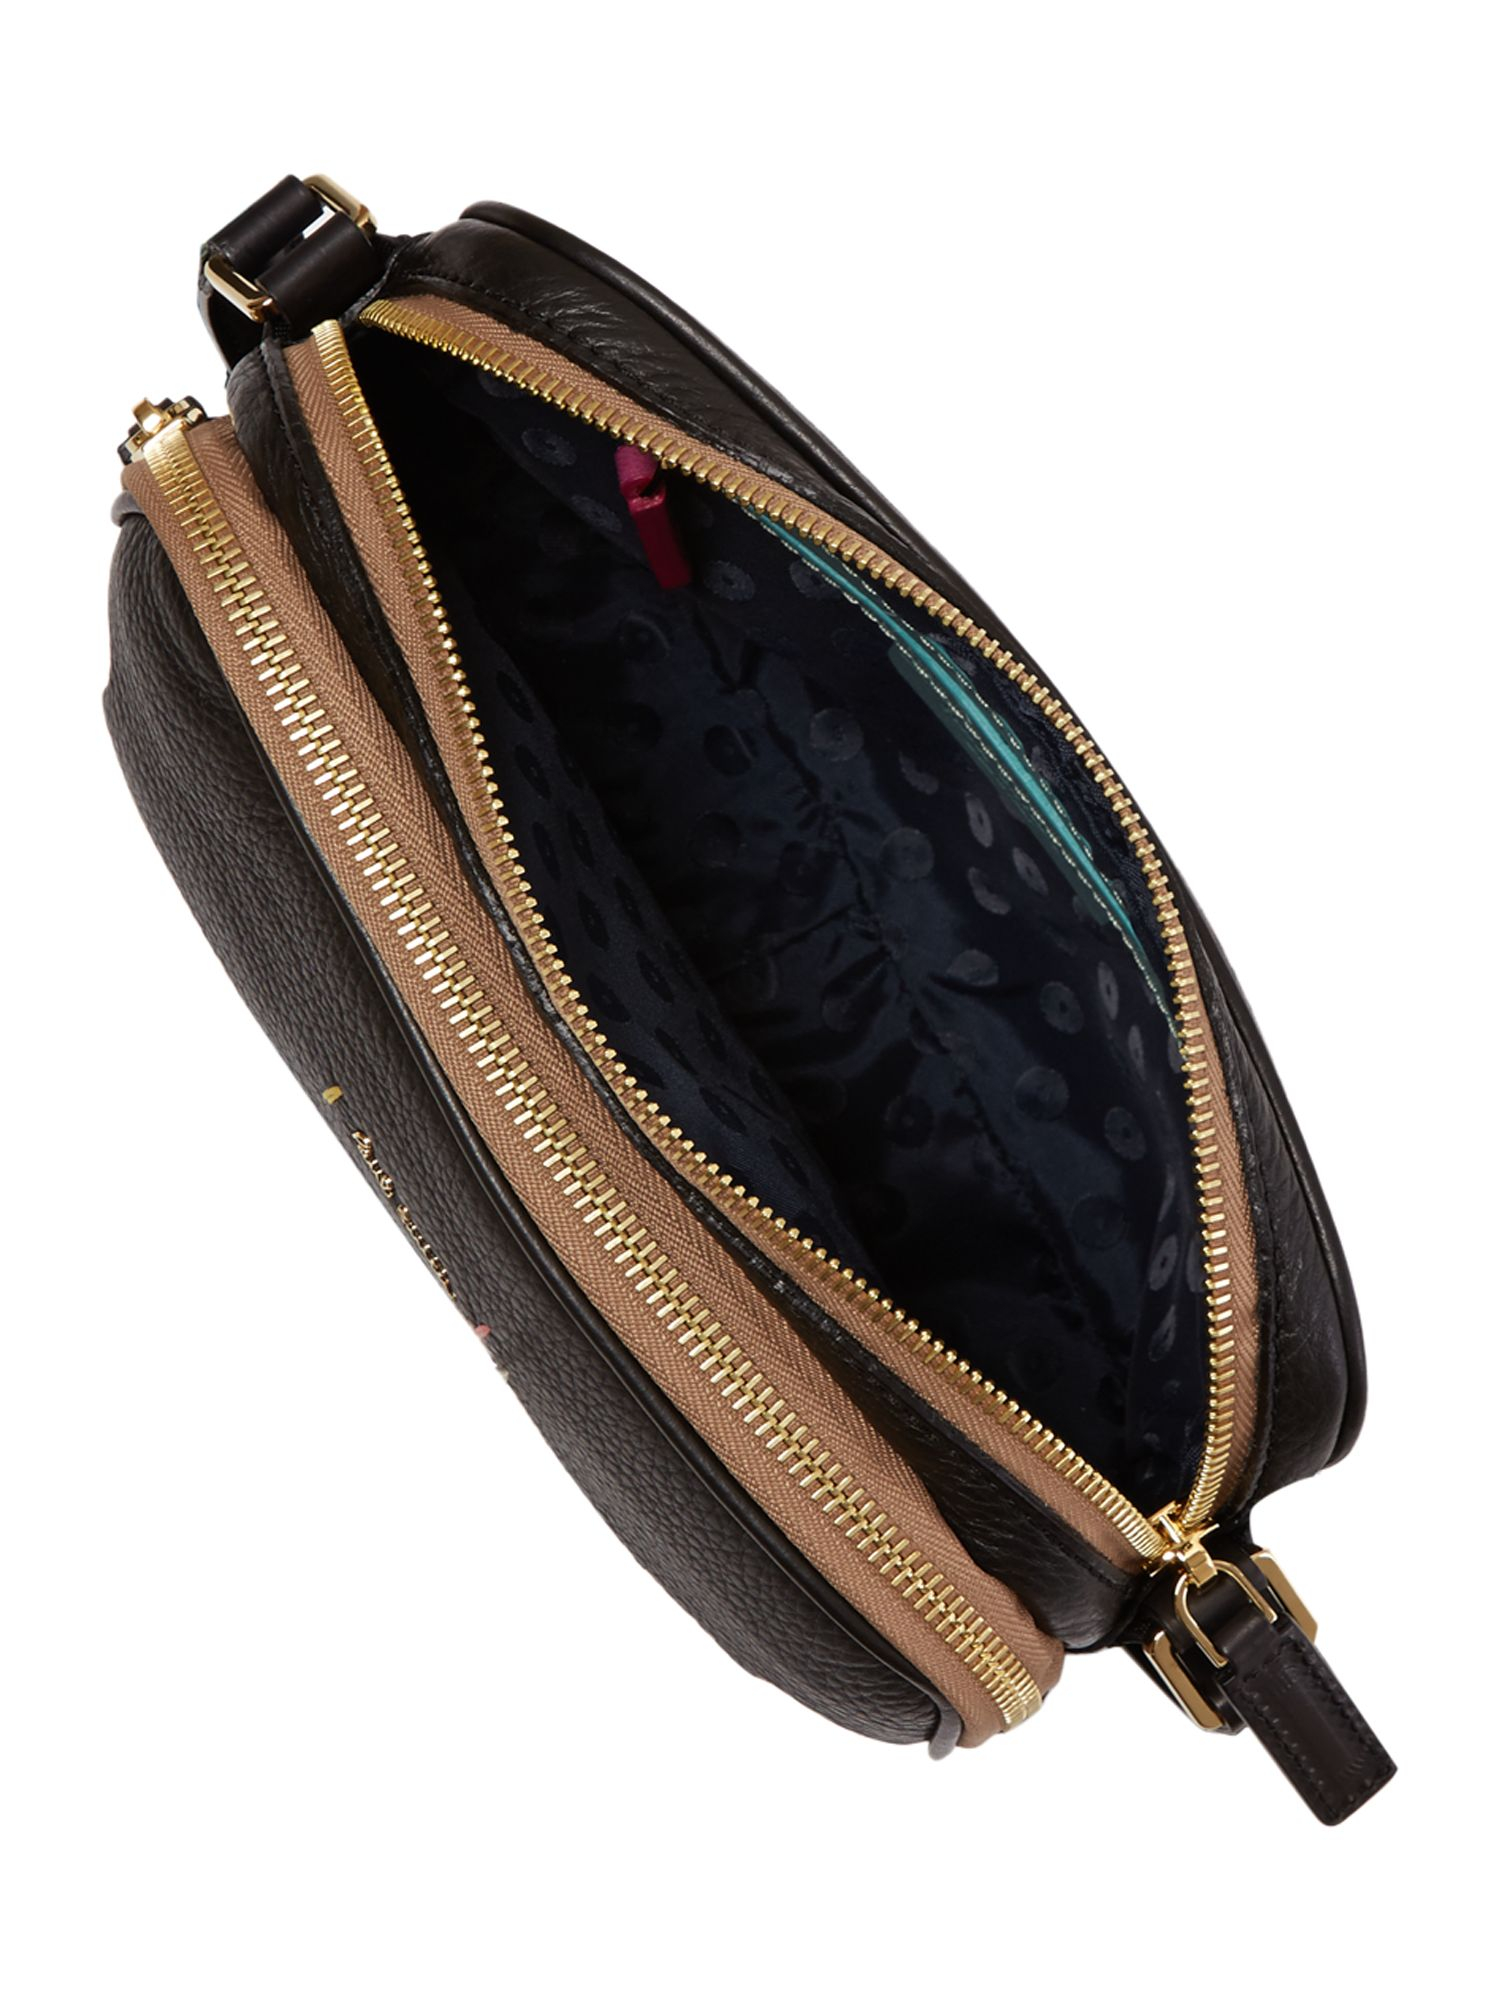 Paul Smith Albermarle Black Mini Cross Body Bag